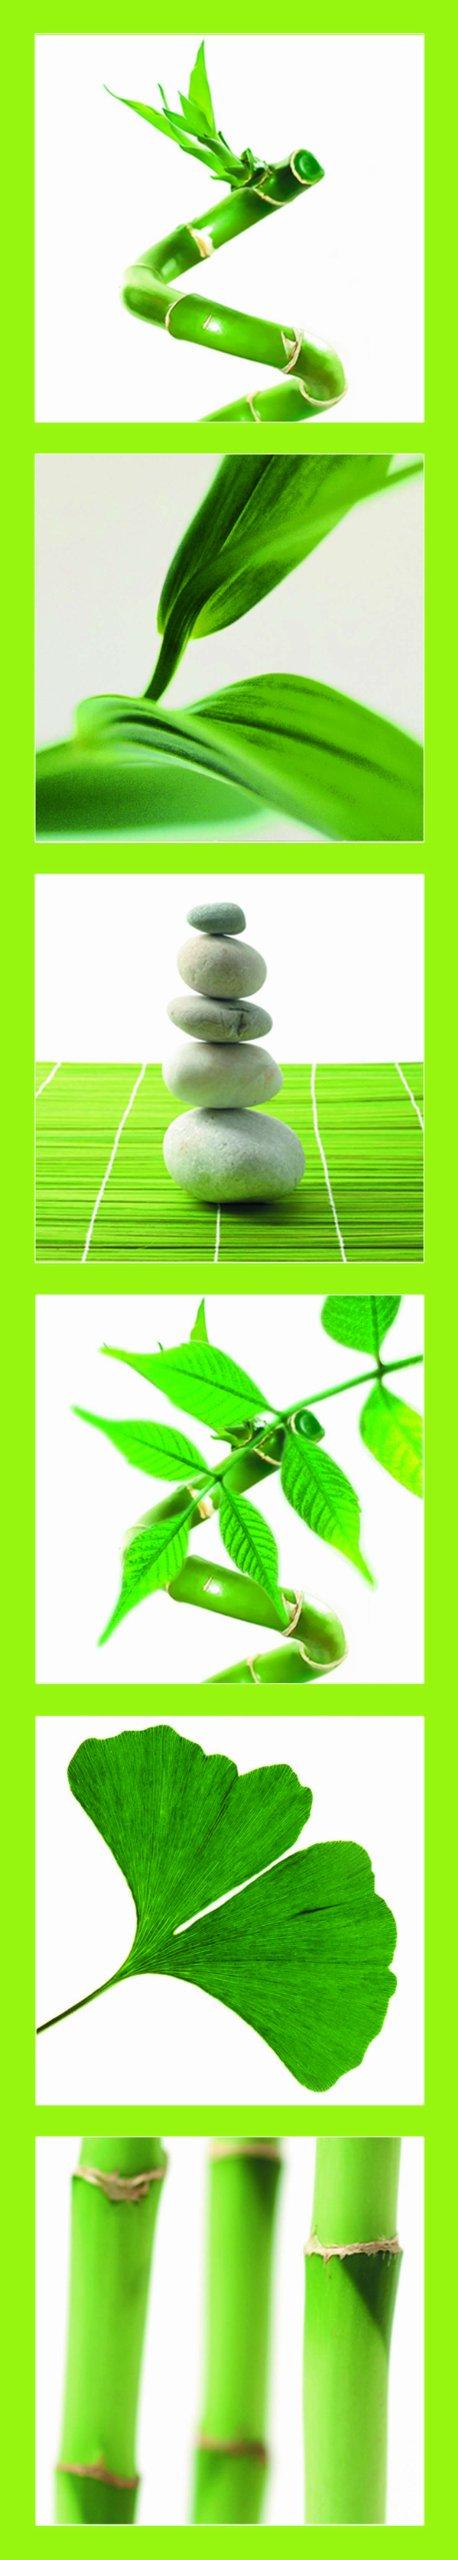 Vinilo Decorativo Pared [08VAL8EI] bambu ginkgo piedras